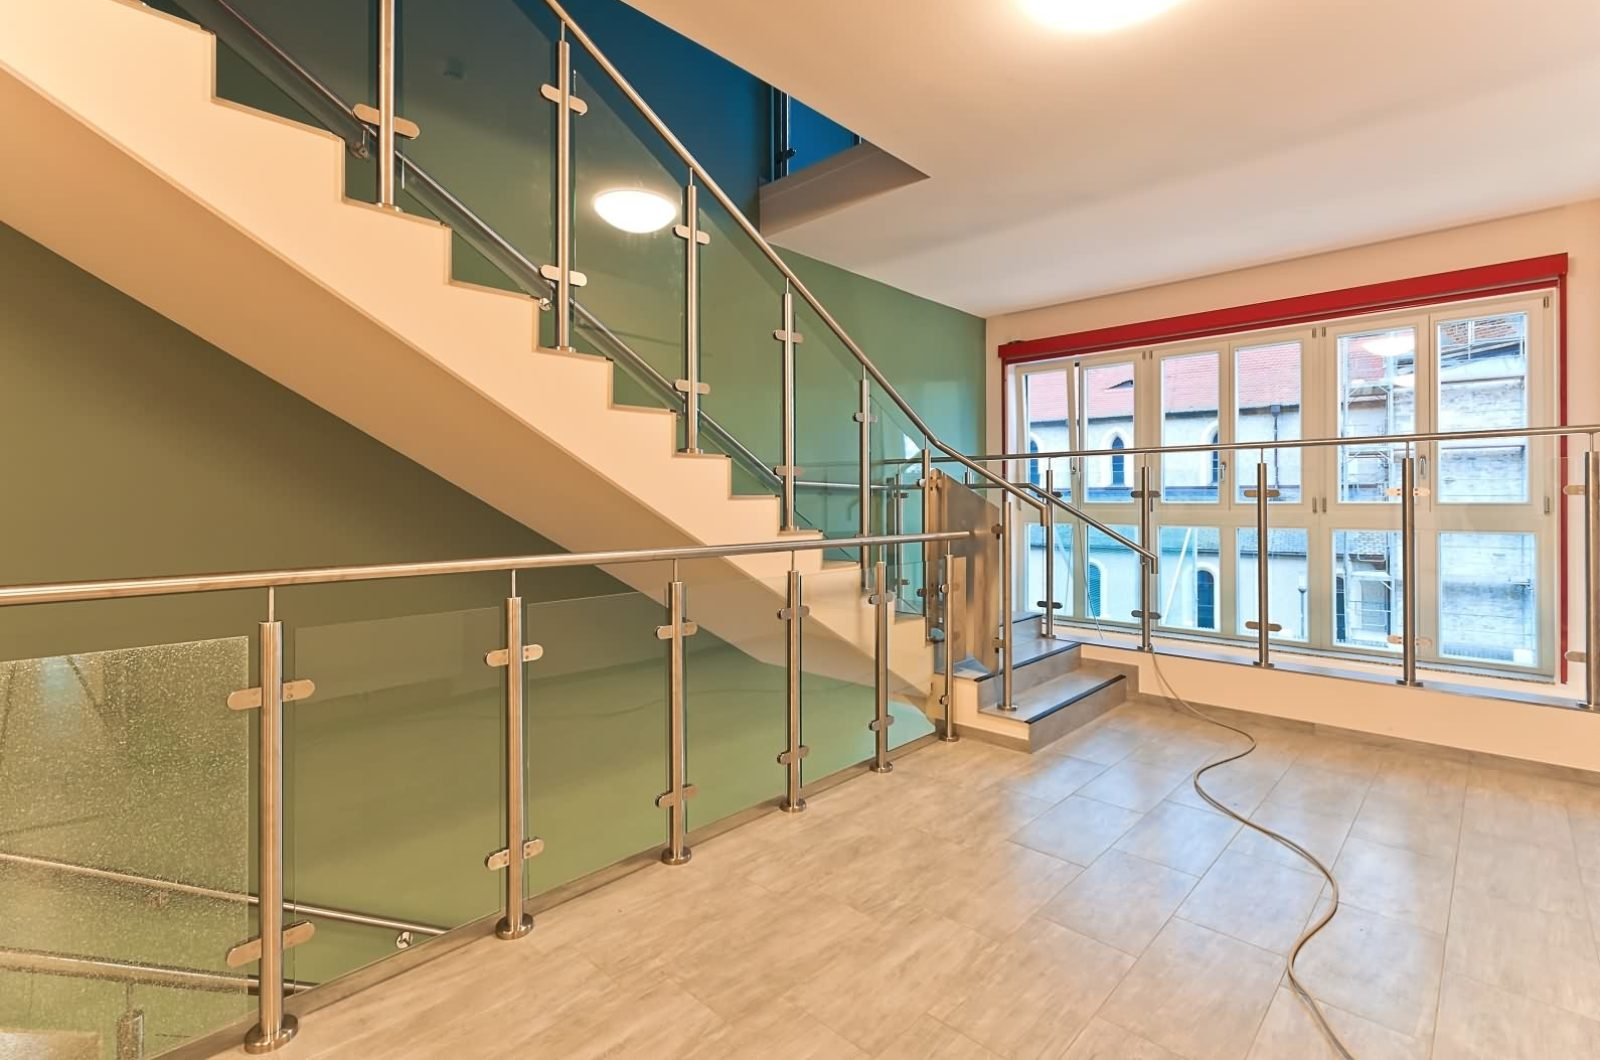 Nolopp Schule Treppe